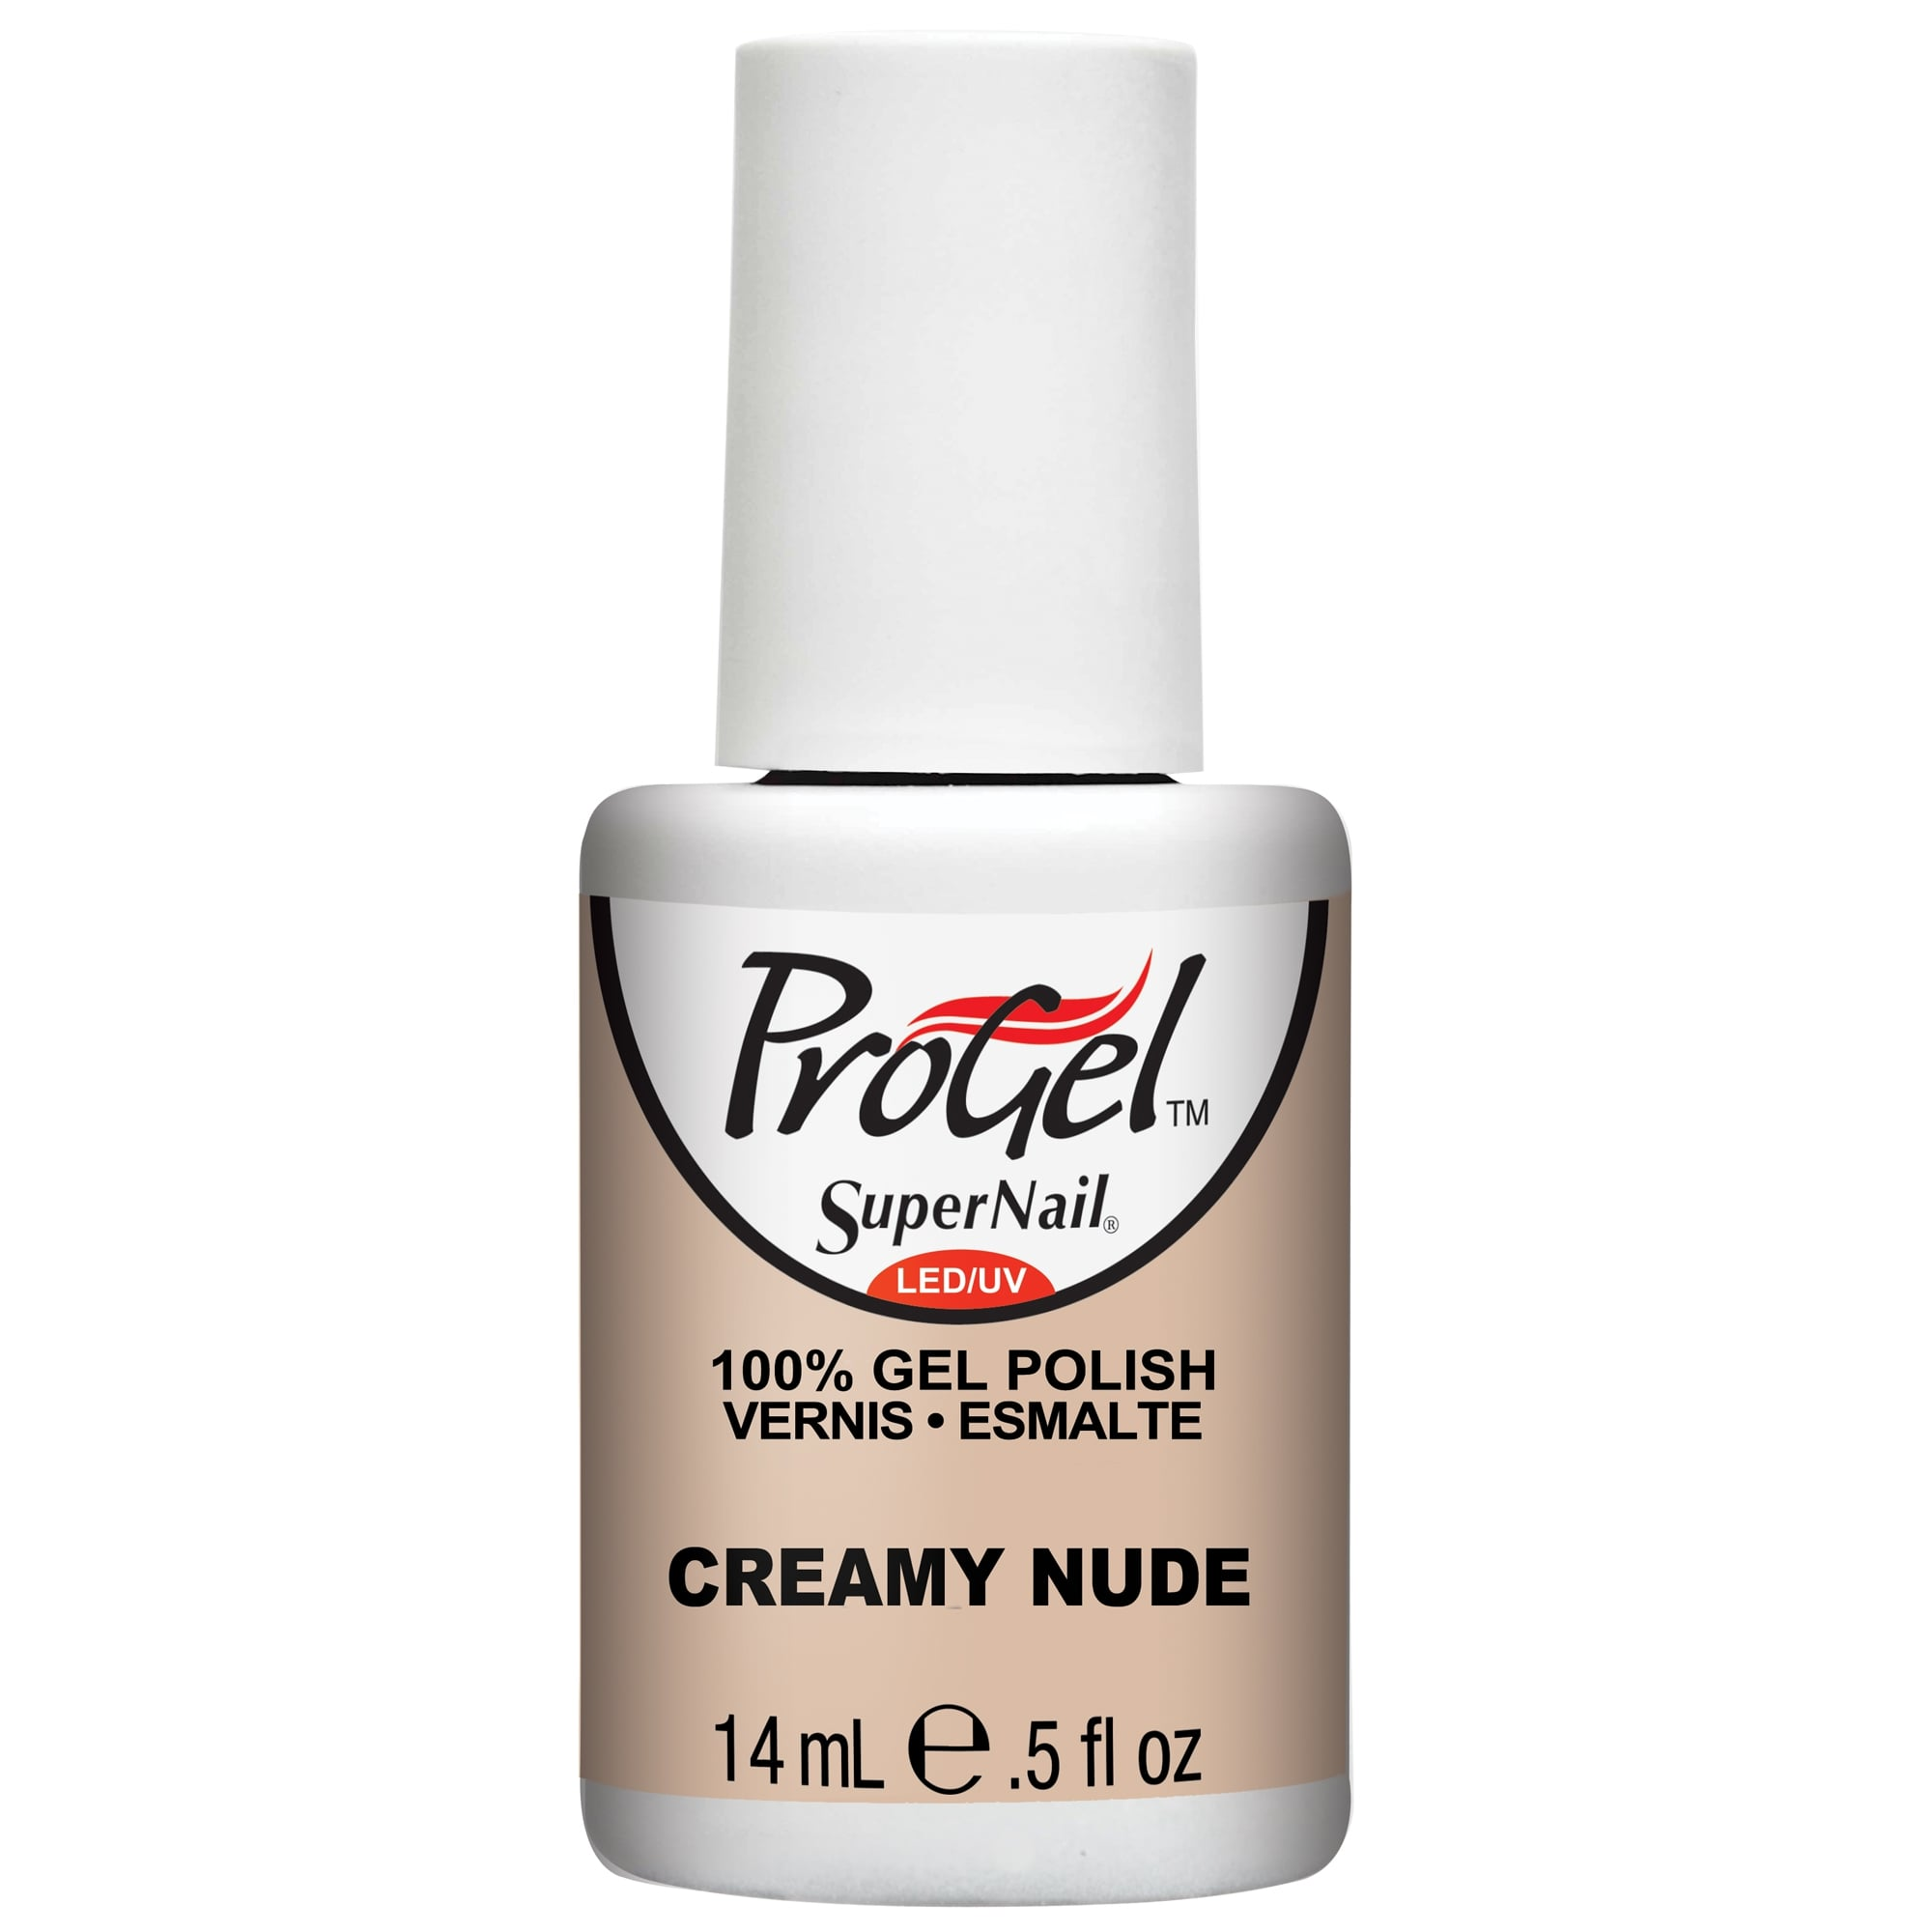 SuperNail ProGel Nail Polish - Creamy Nude 14mL | Professional Nails